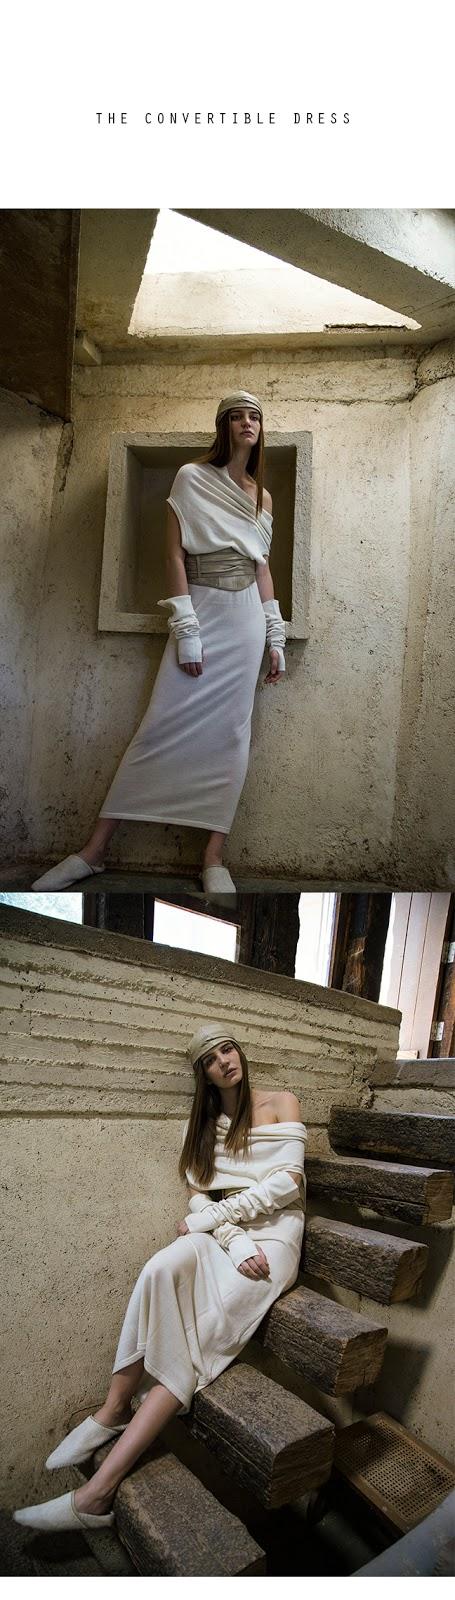 The Convertible Dress by Nicholas K